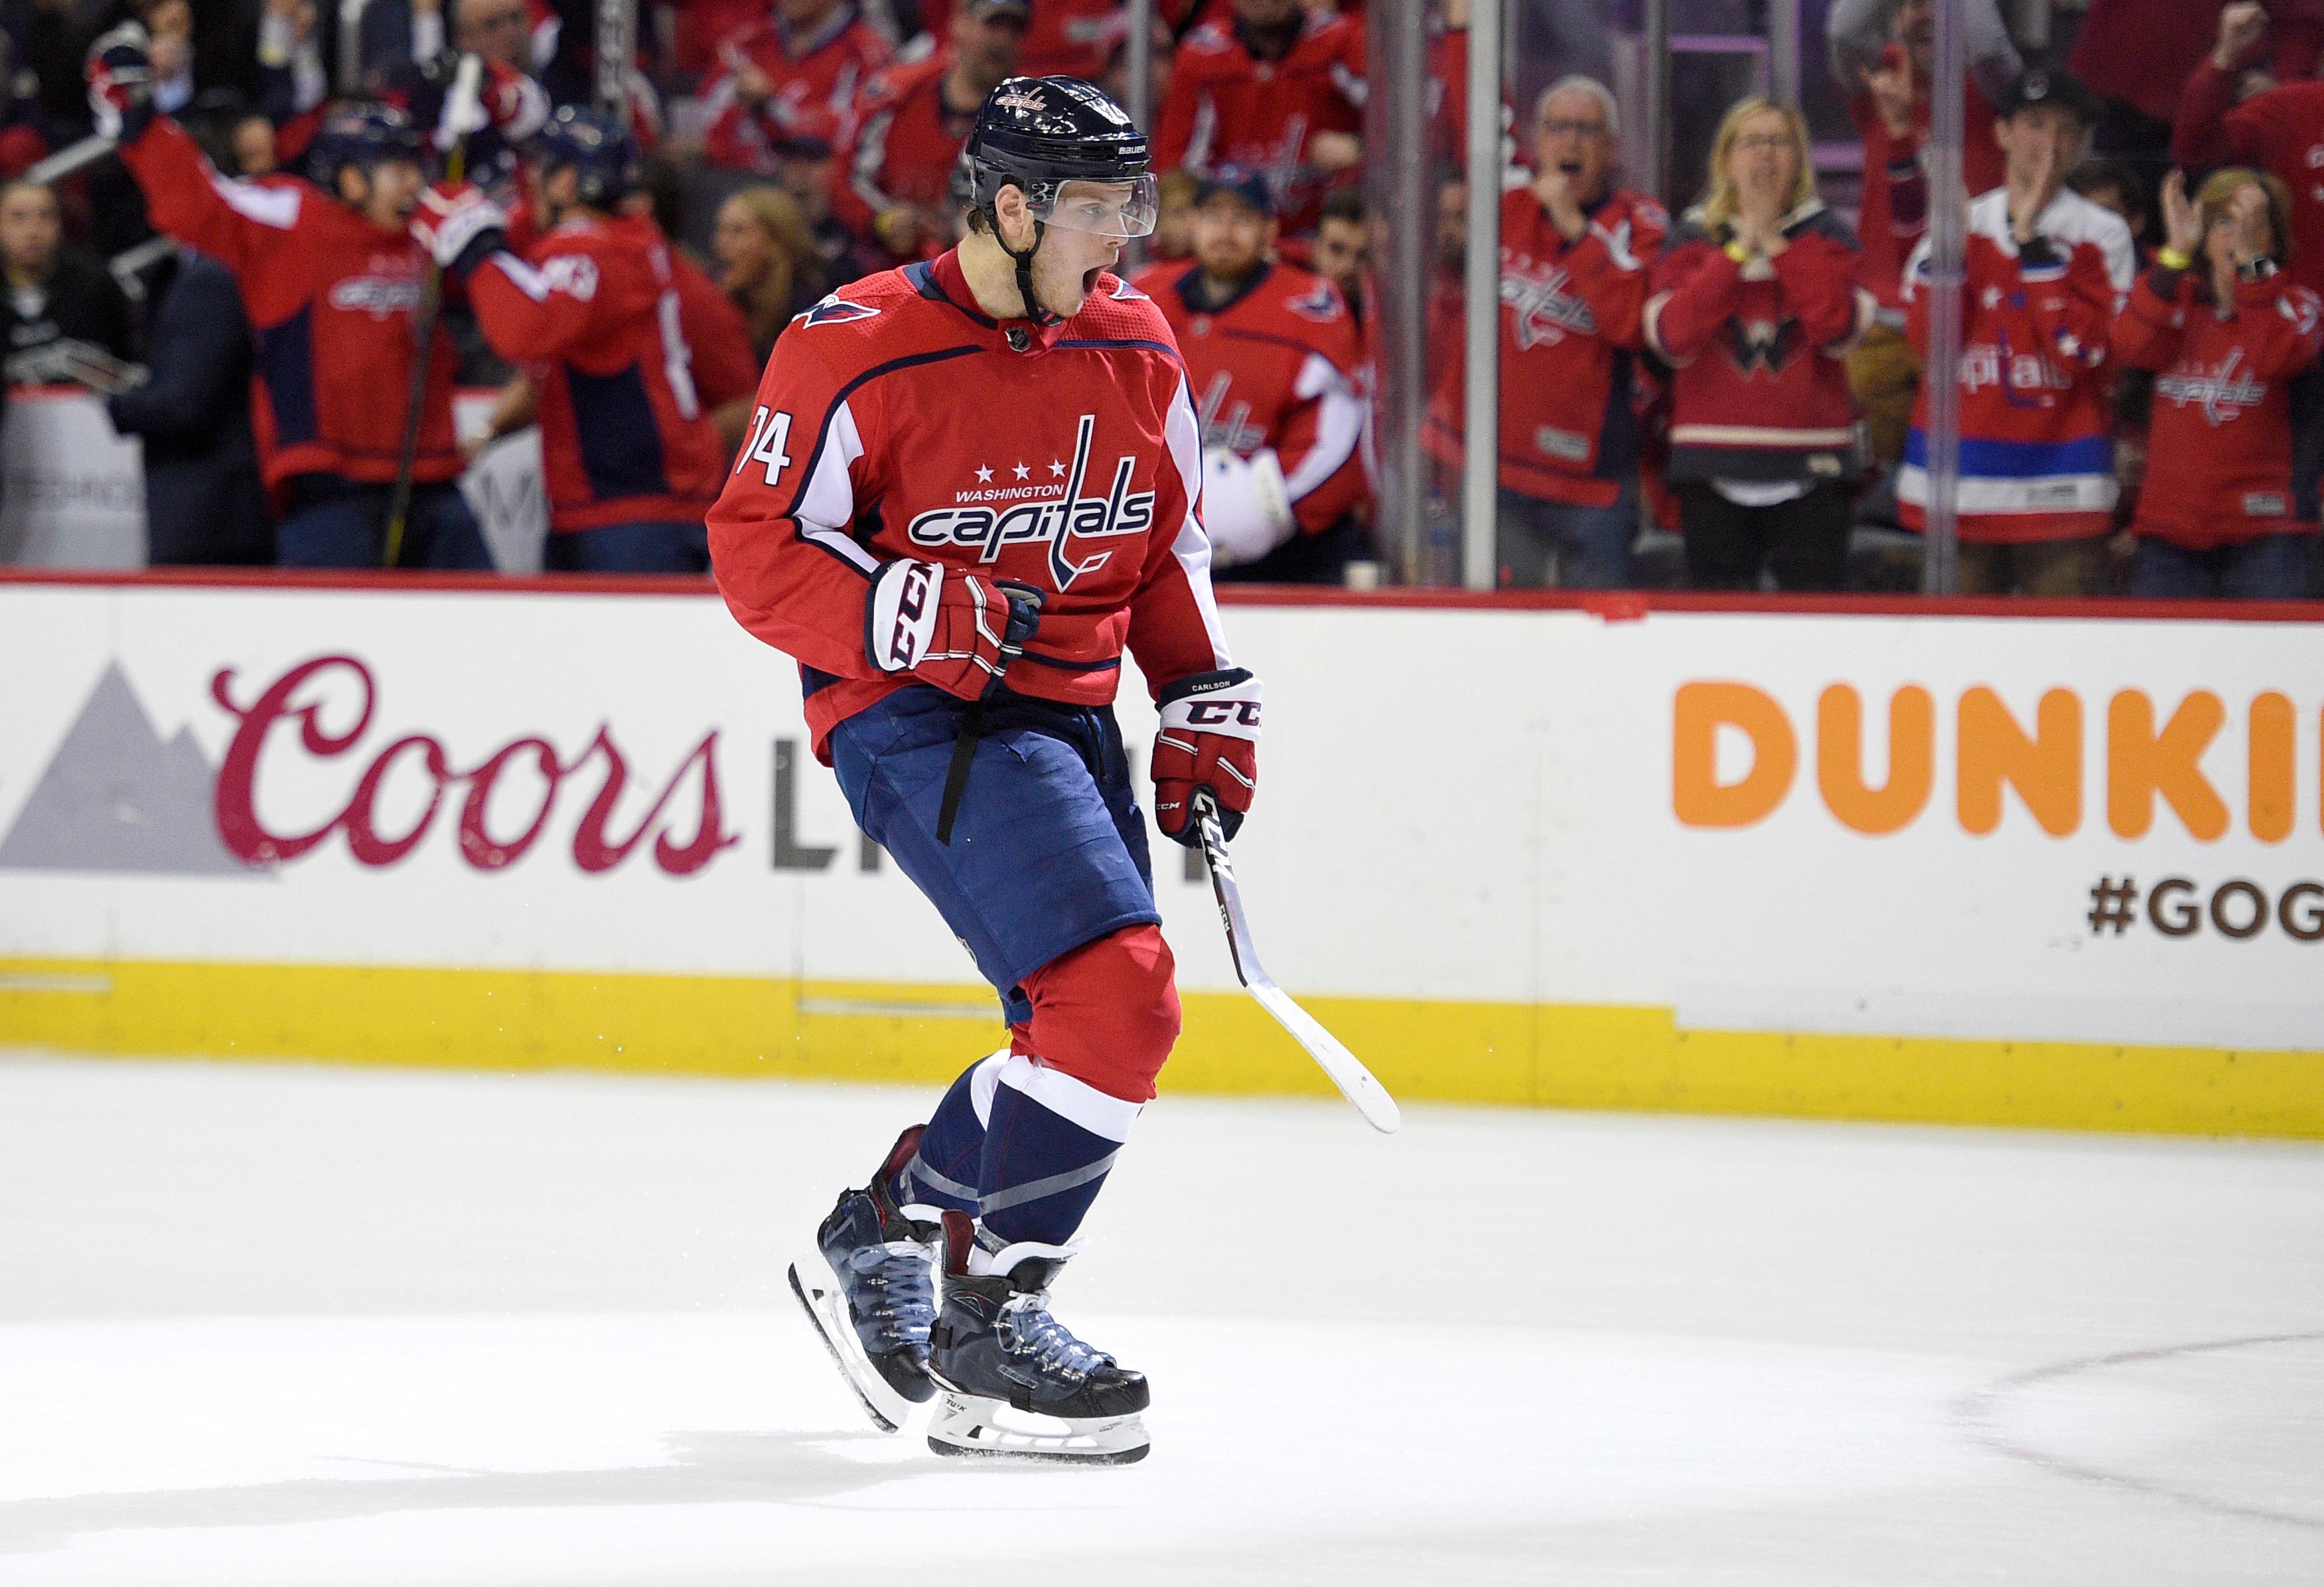 Salary-cap increase makes for  more fun  NHL offseason - Washington ... c7ff31a4d43